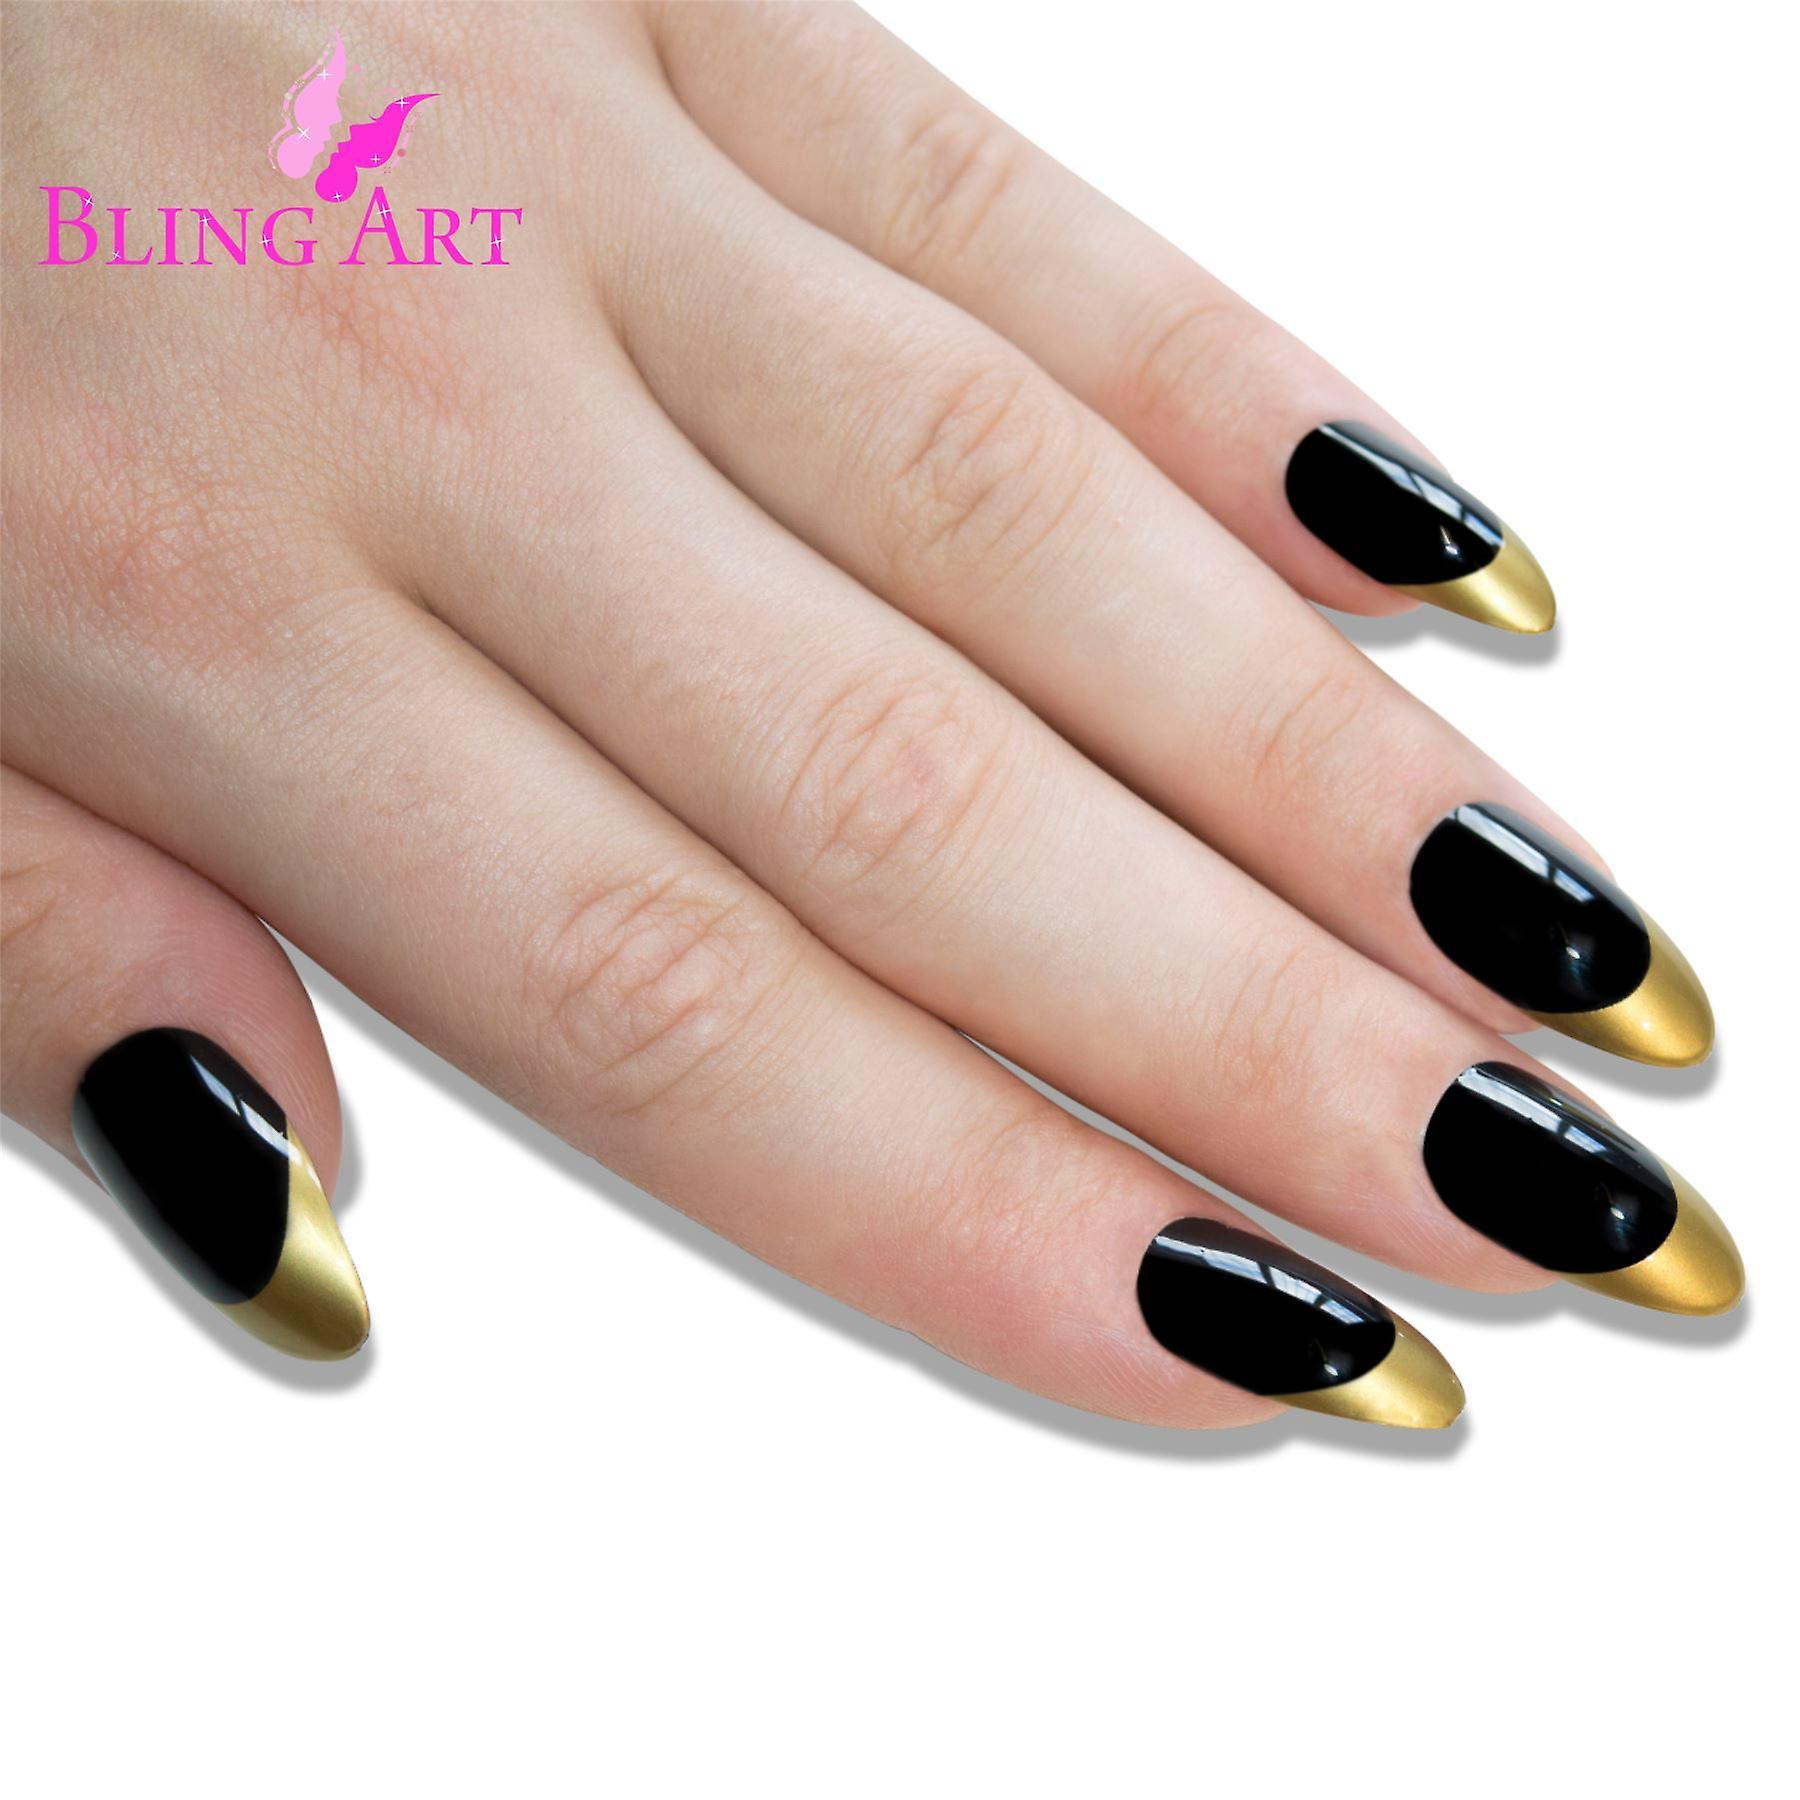 False nails bling art black gold almond stiletto long fake acrylic tips with glue